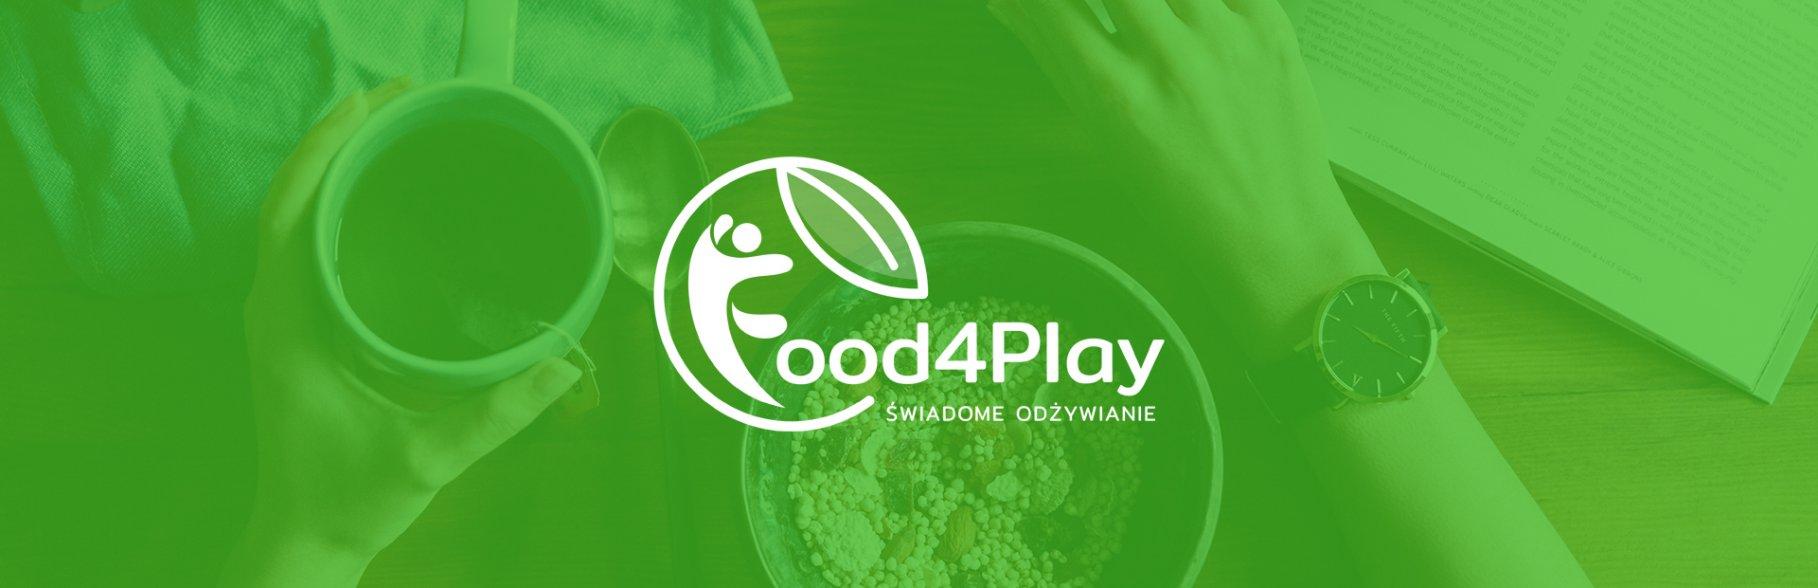 Food4Play